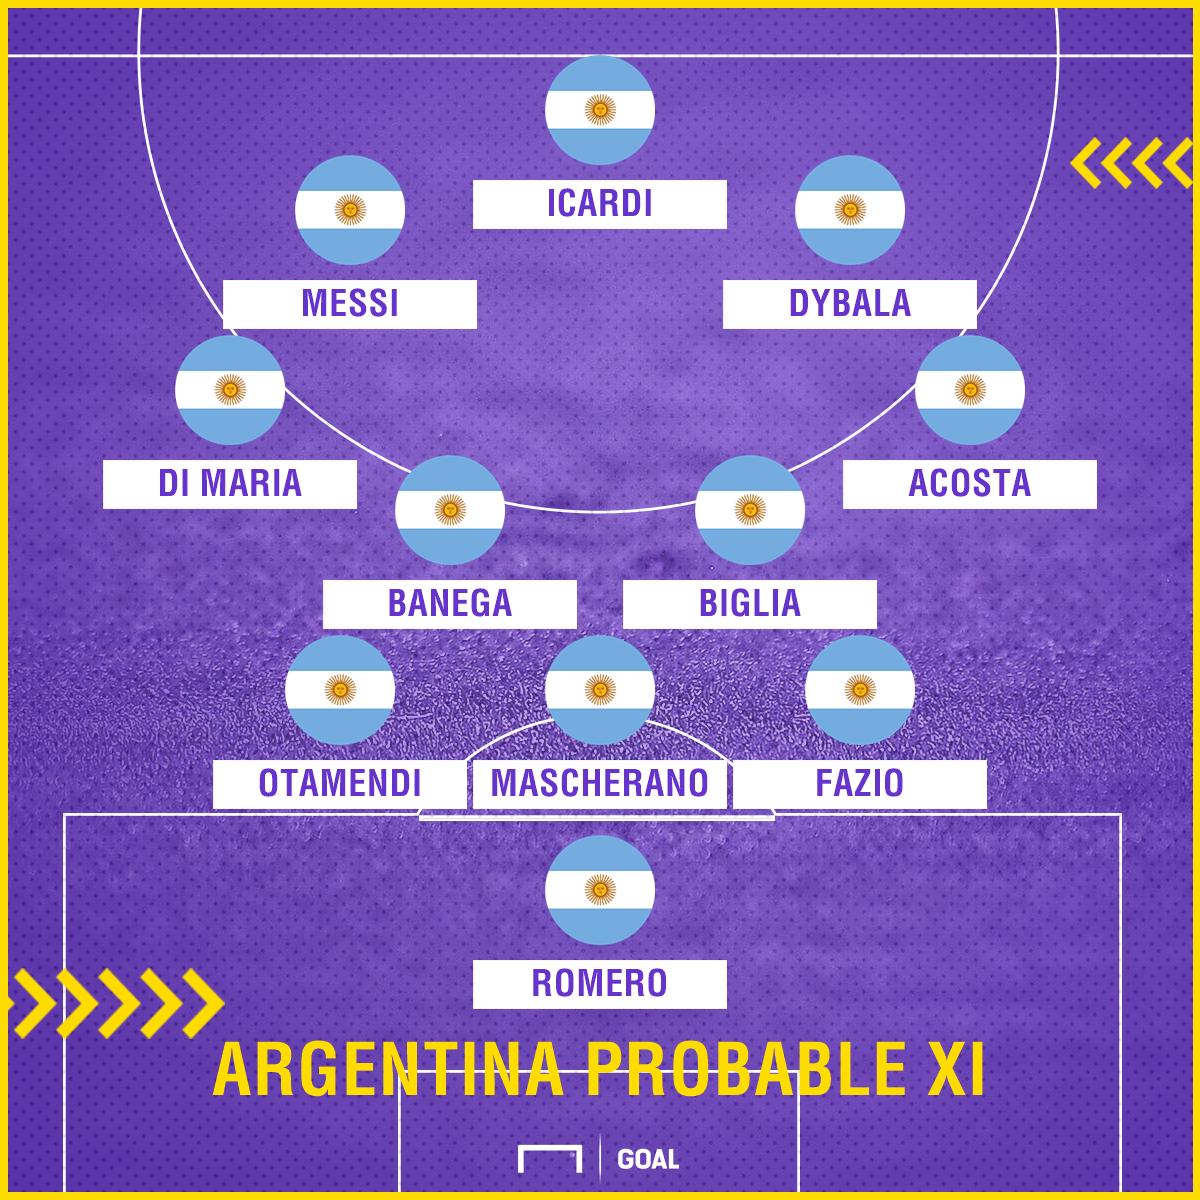 Argentina XI